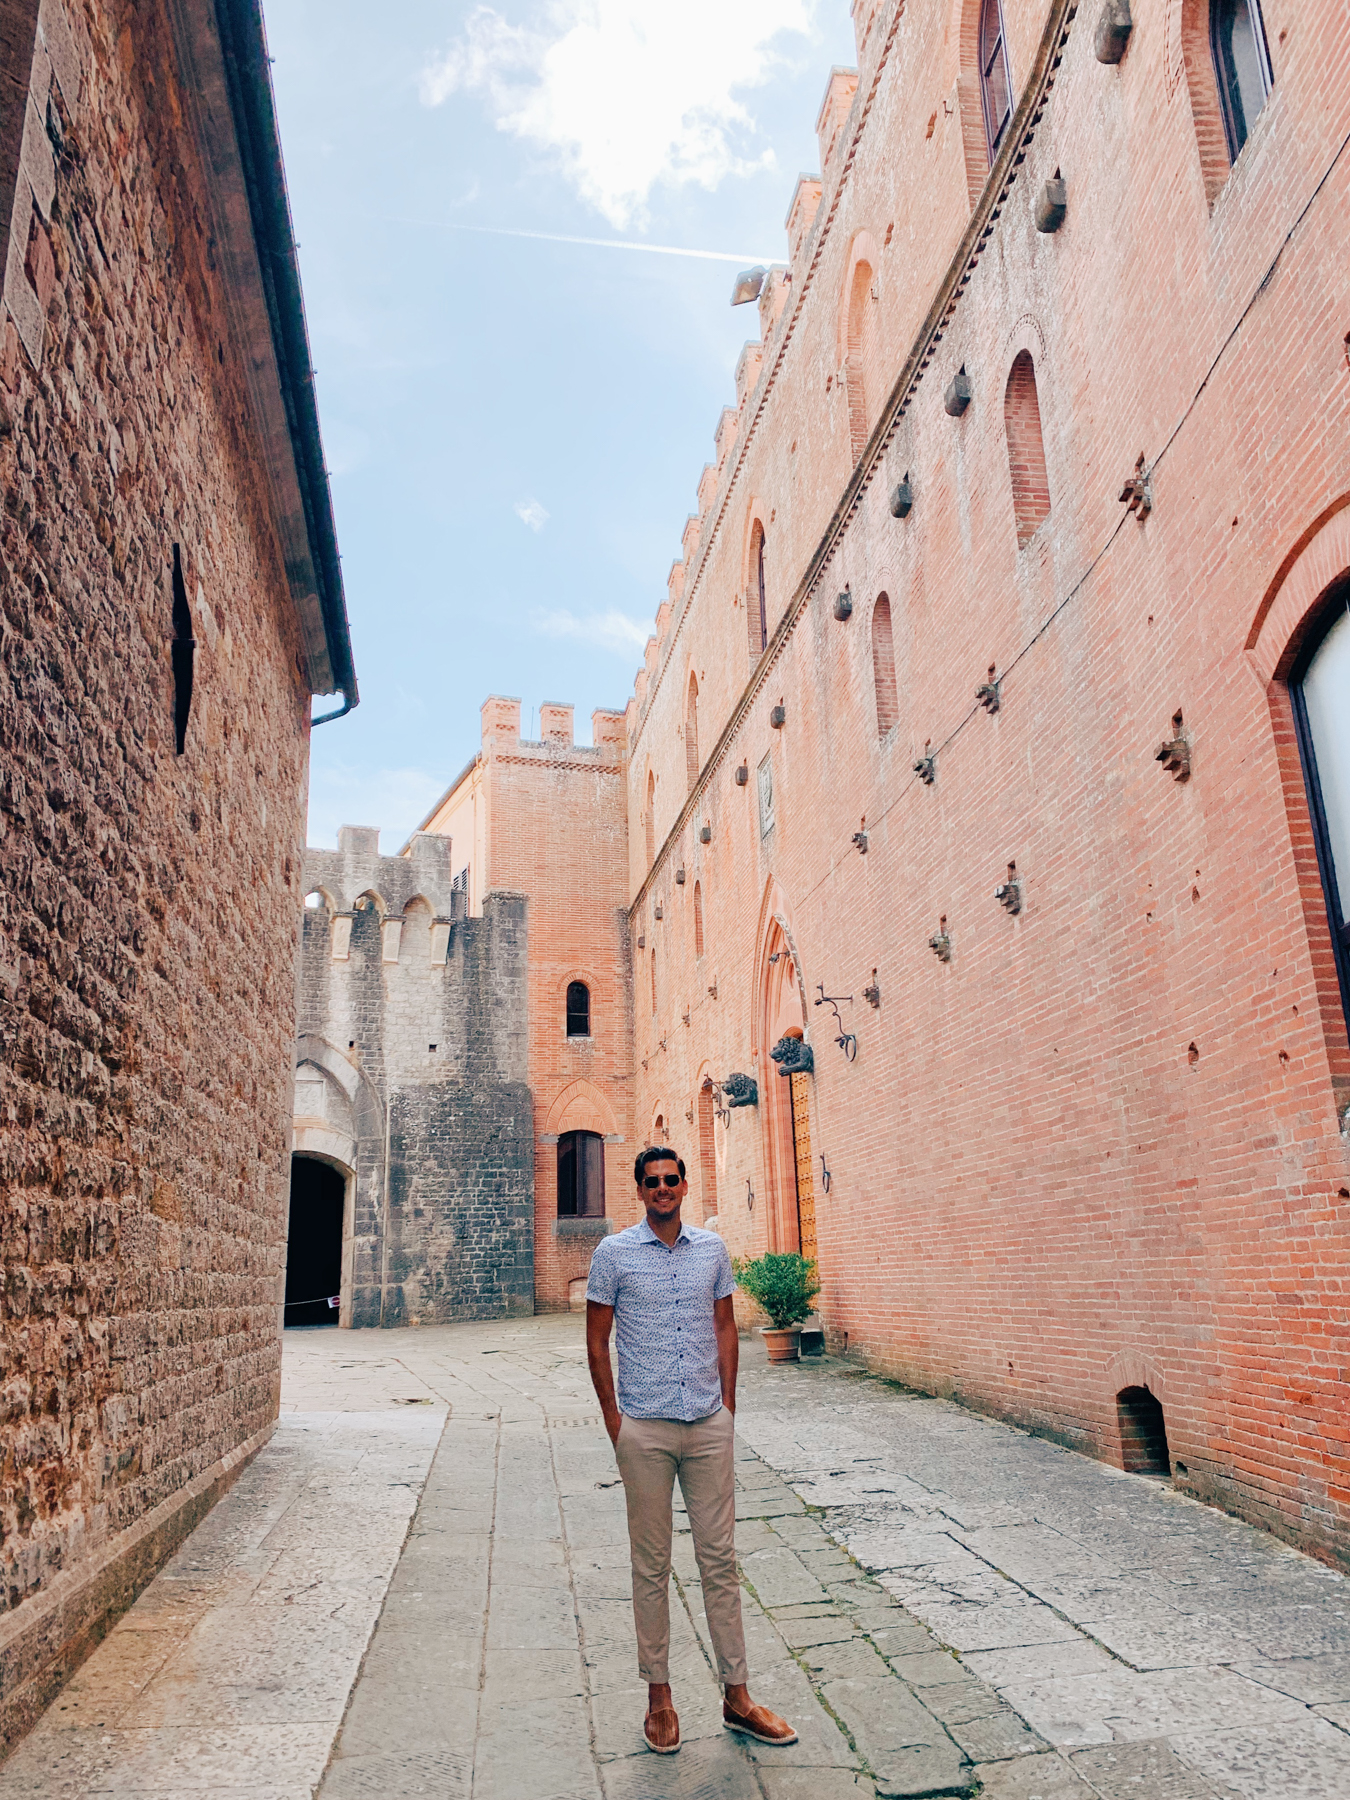 Walking into Castello di Brolio for our first tour.